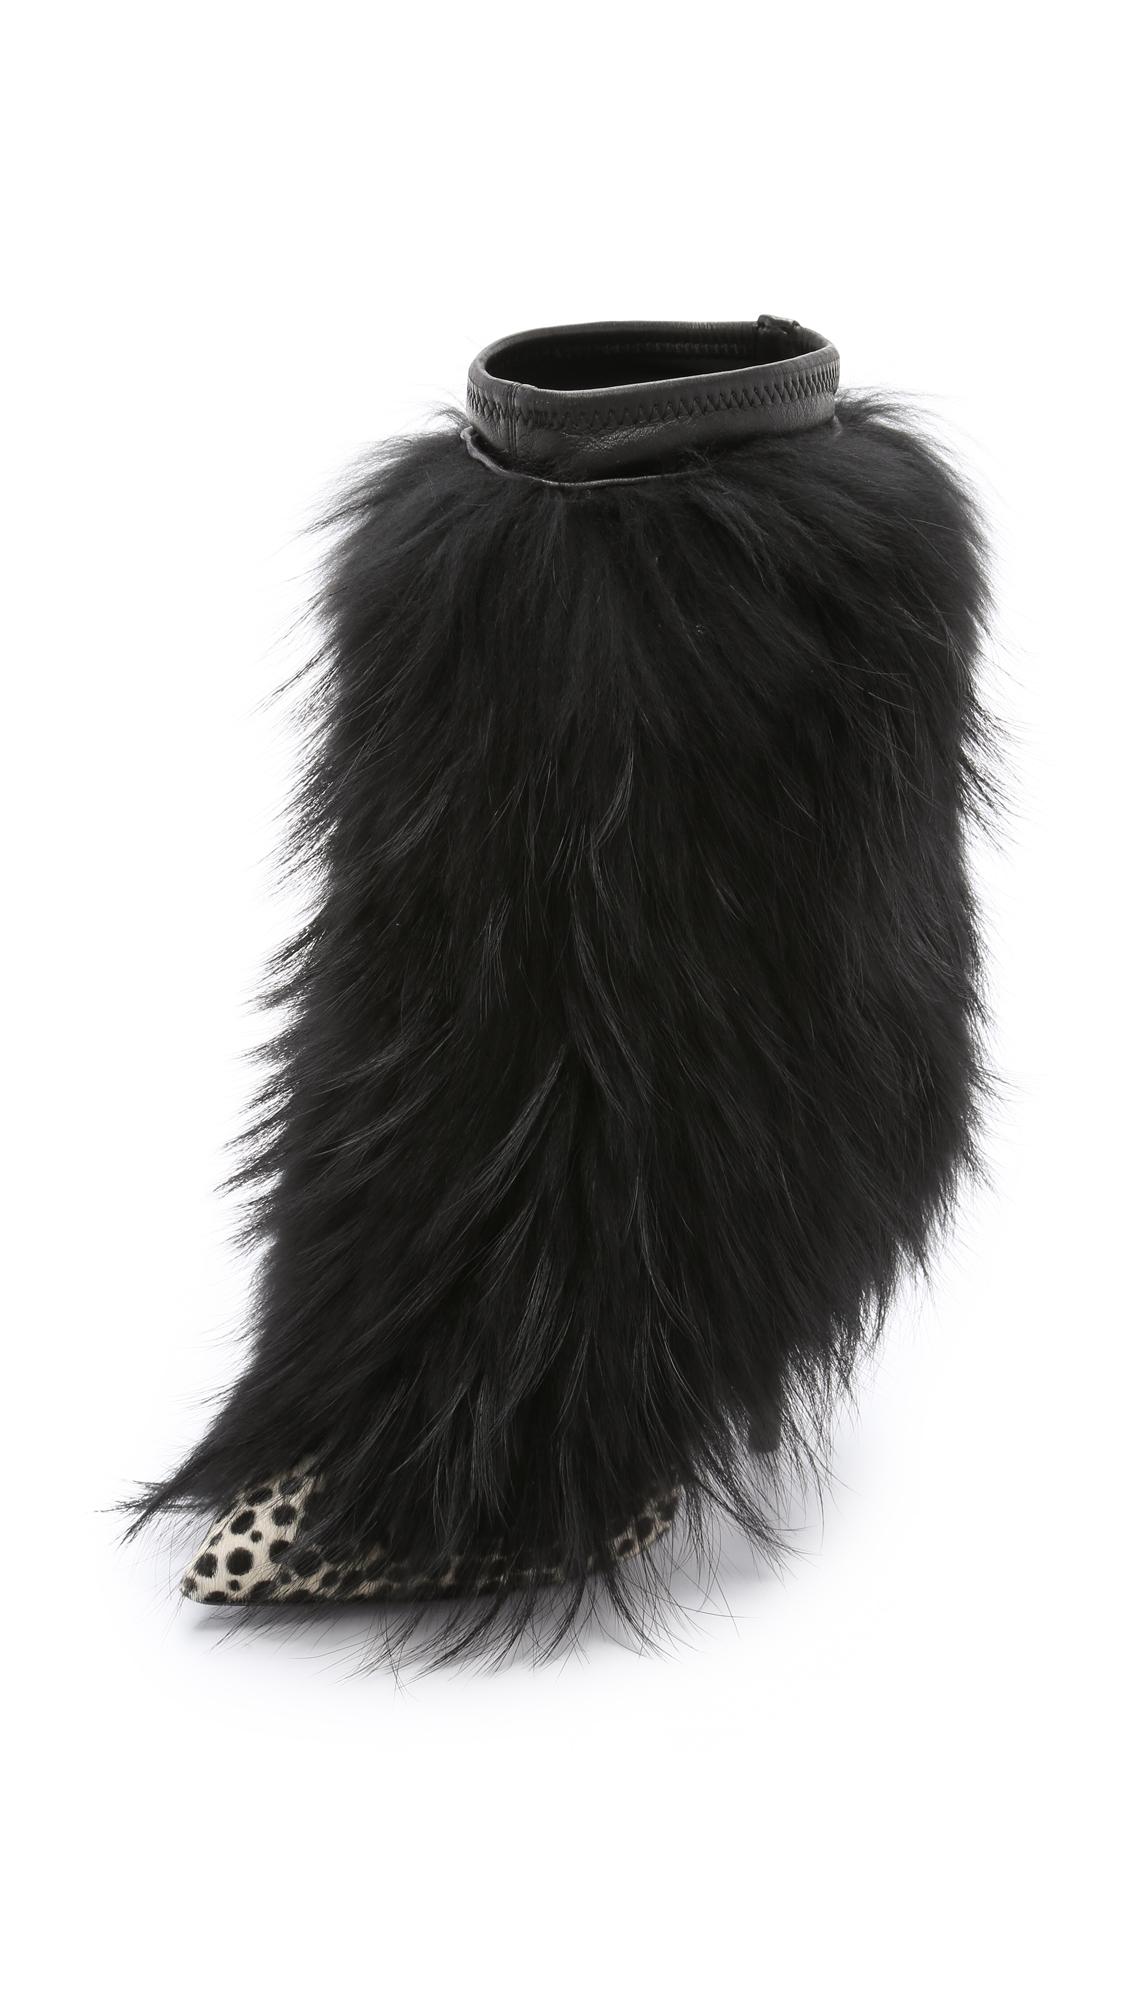 Giuseppe Zanotti Fur Boots - Black at Shopbop